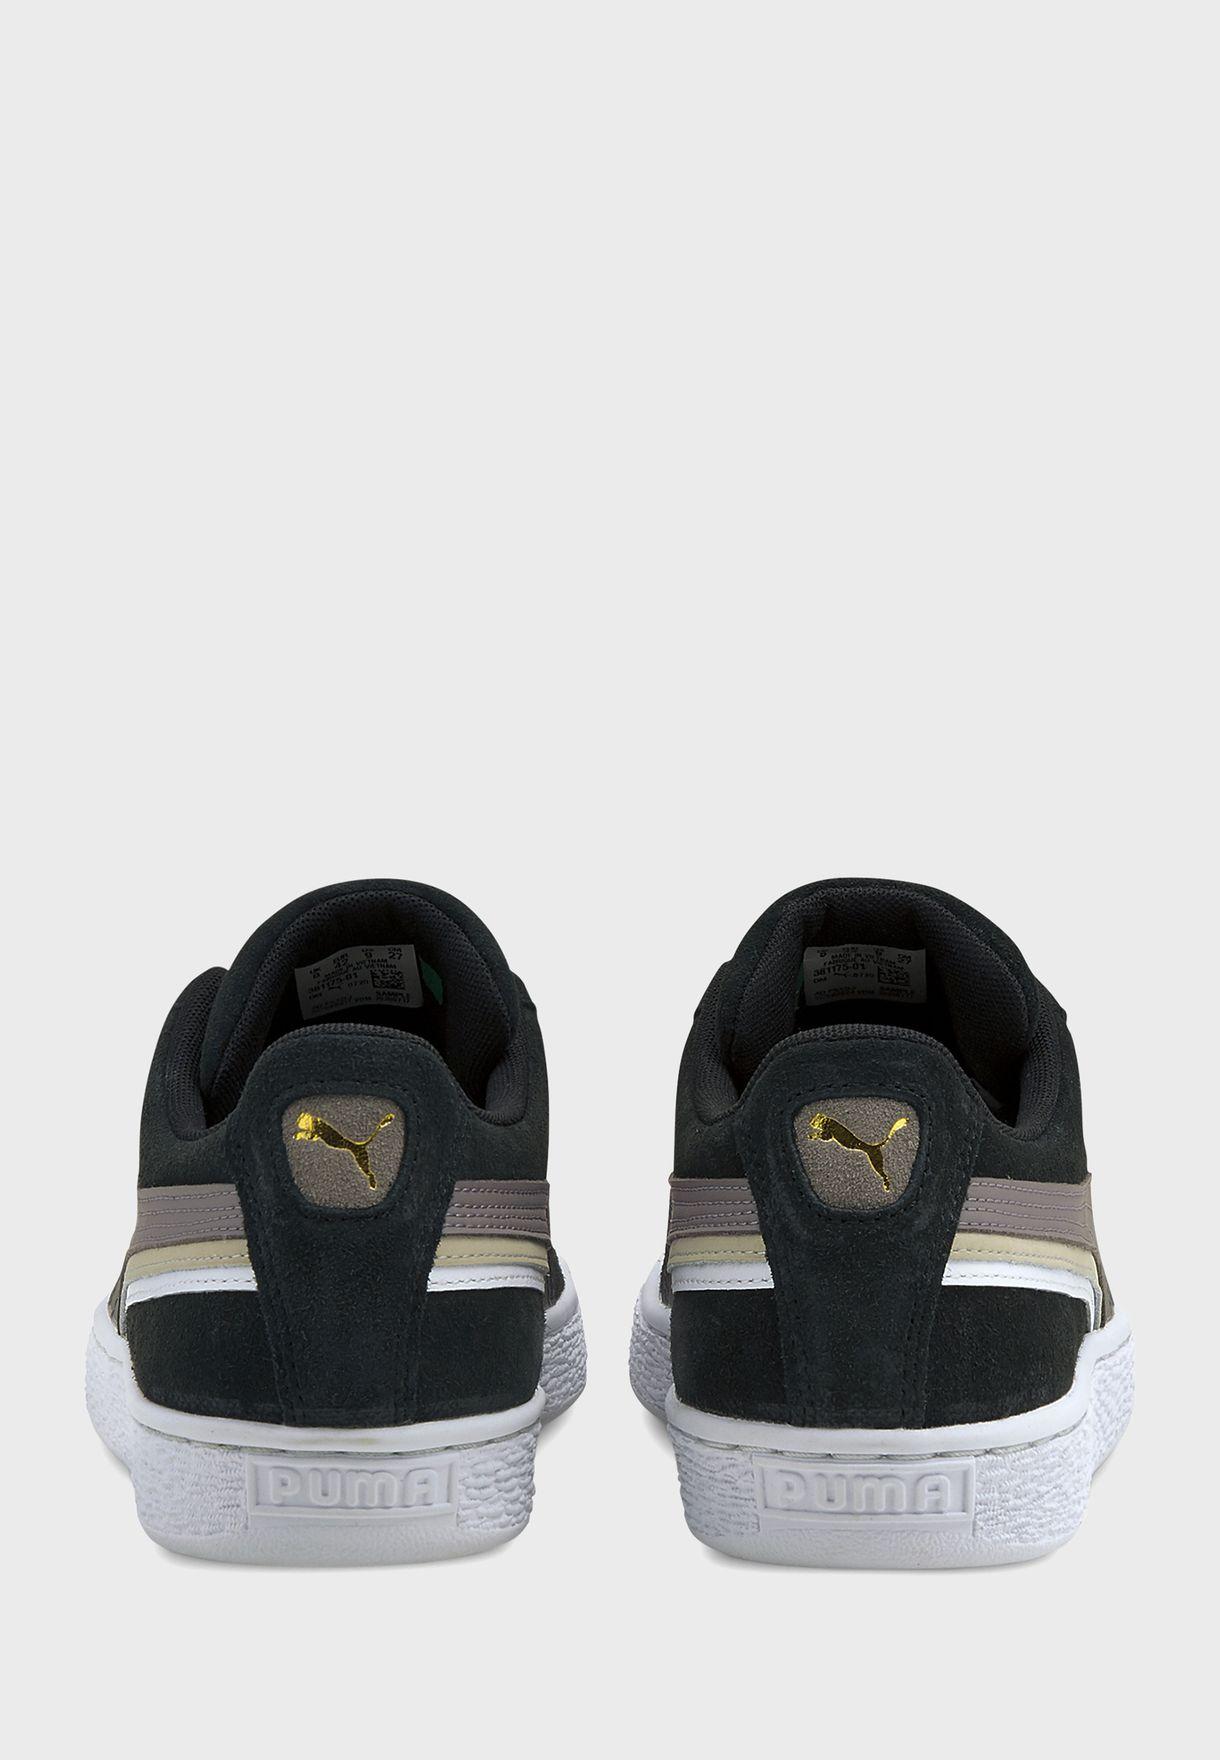 حذاء سويد تريبليكس